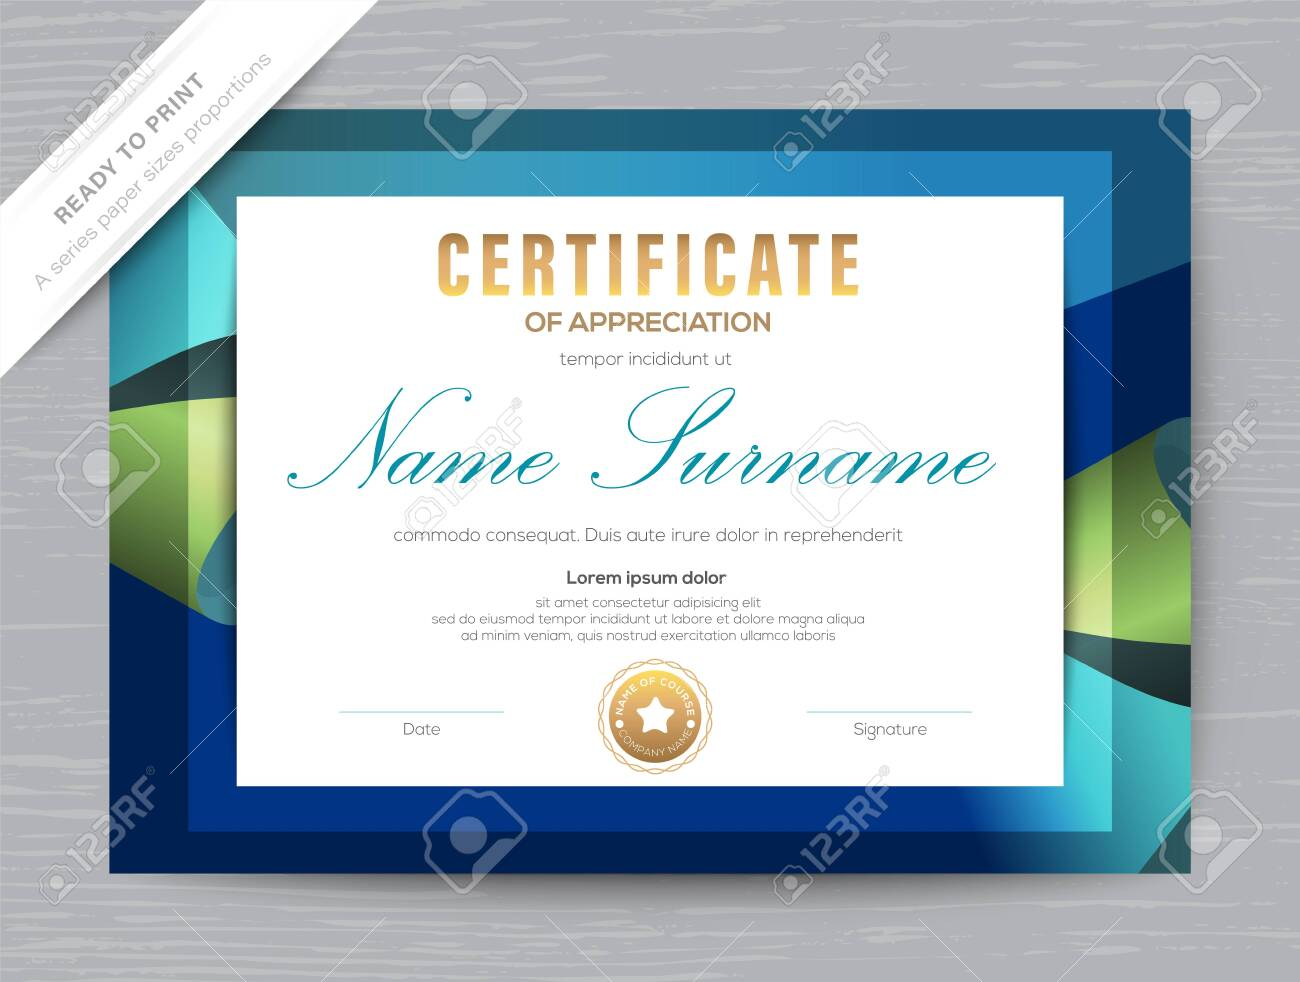 Certificate of Appreciation award diploma template. Dark blue background - 149271371